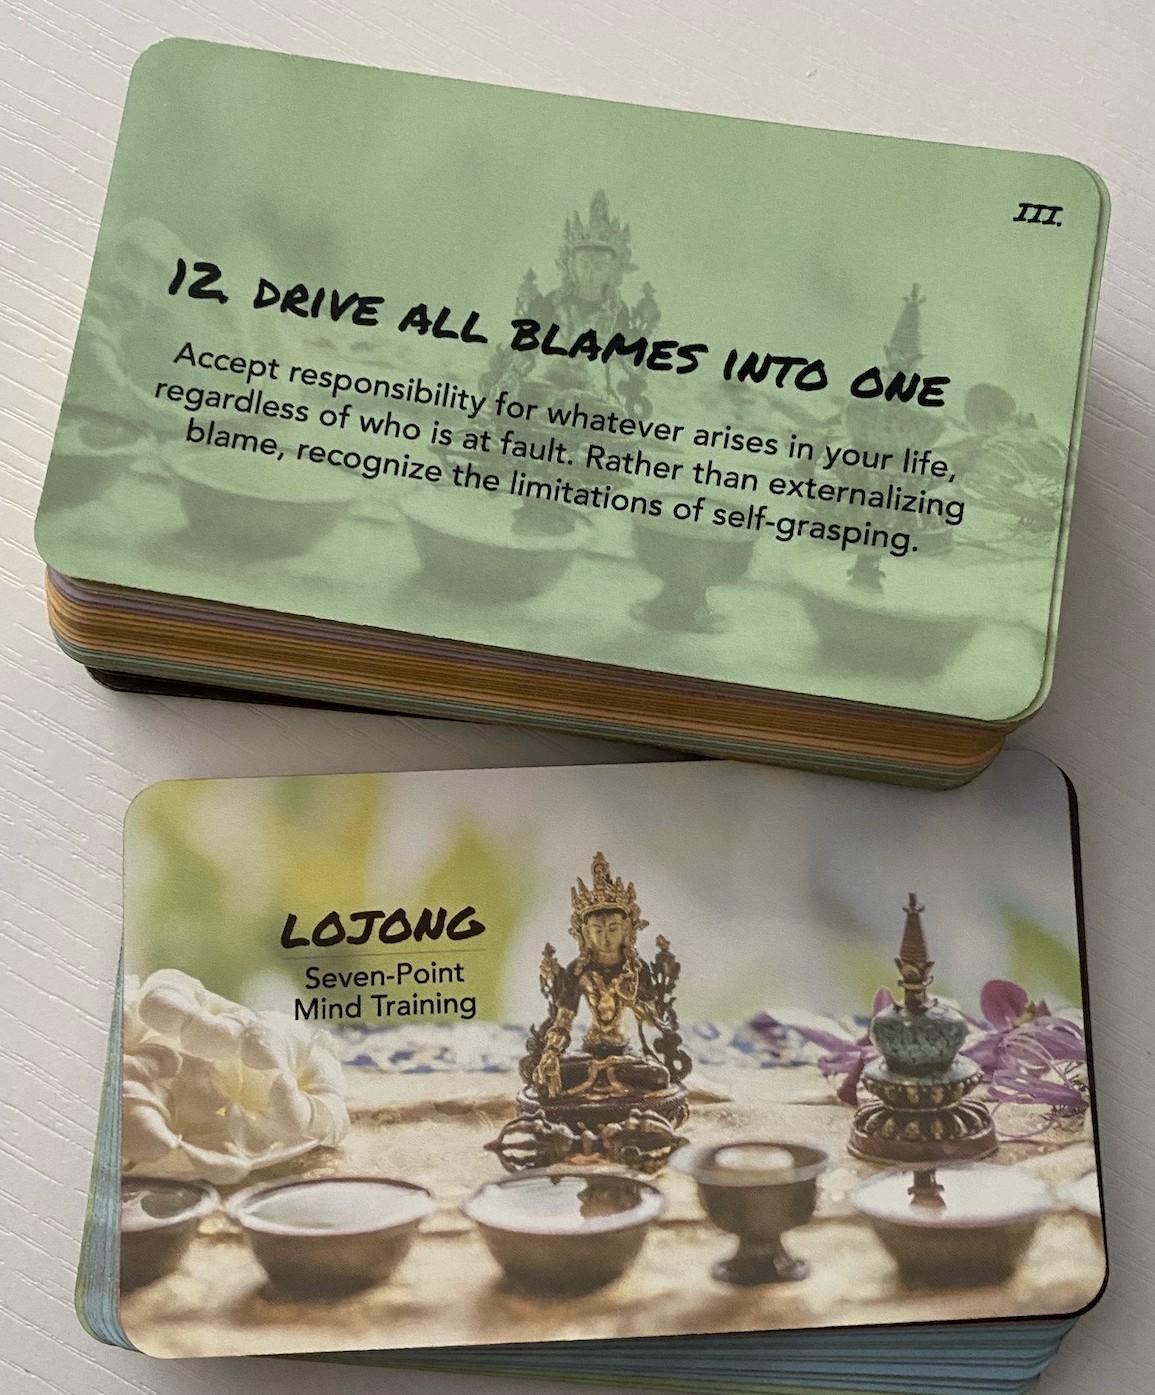 Lojong slogan card deck